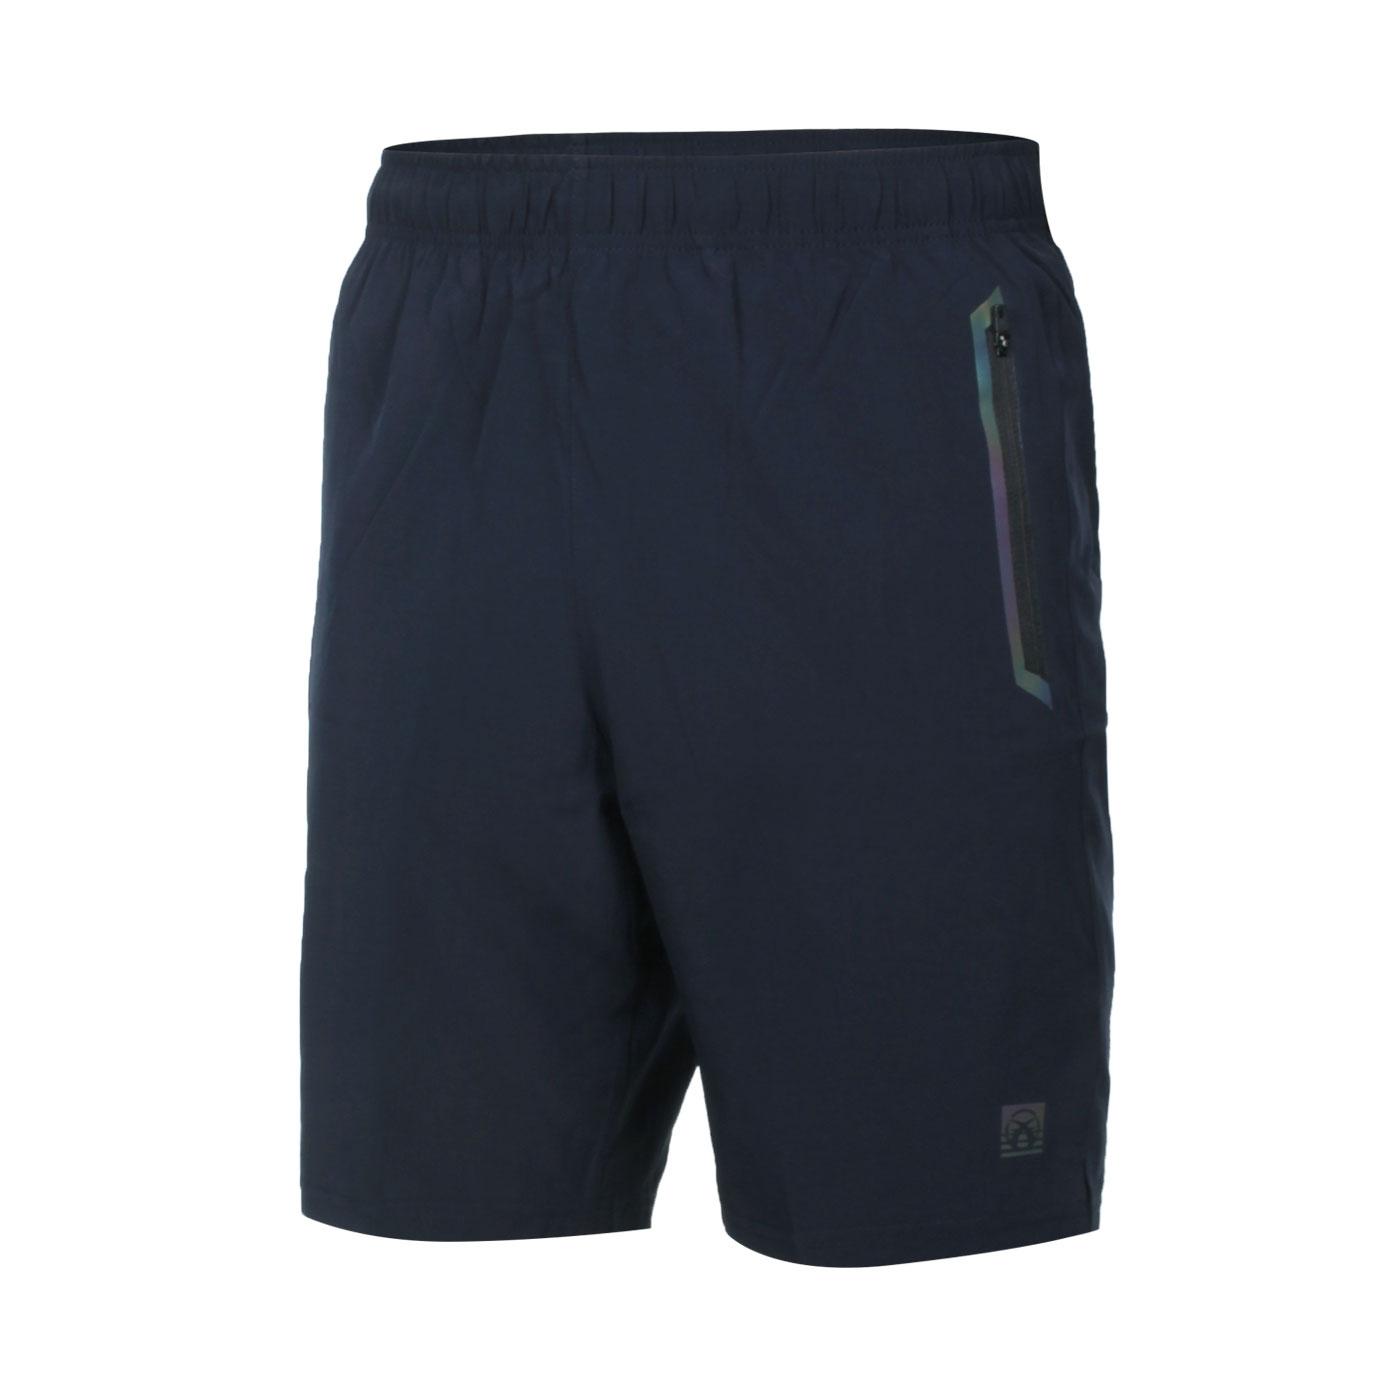 FIRESTAR 男款彈性平織短褲 C1717-93